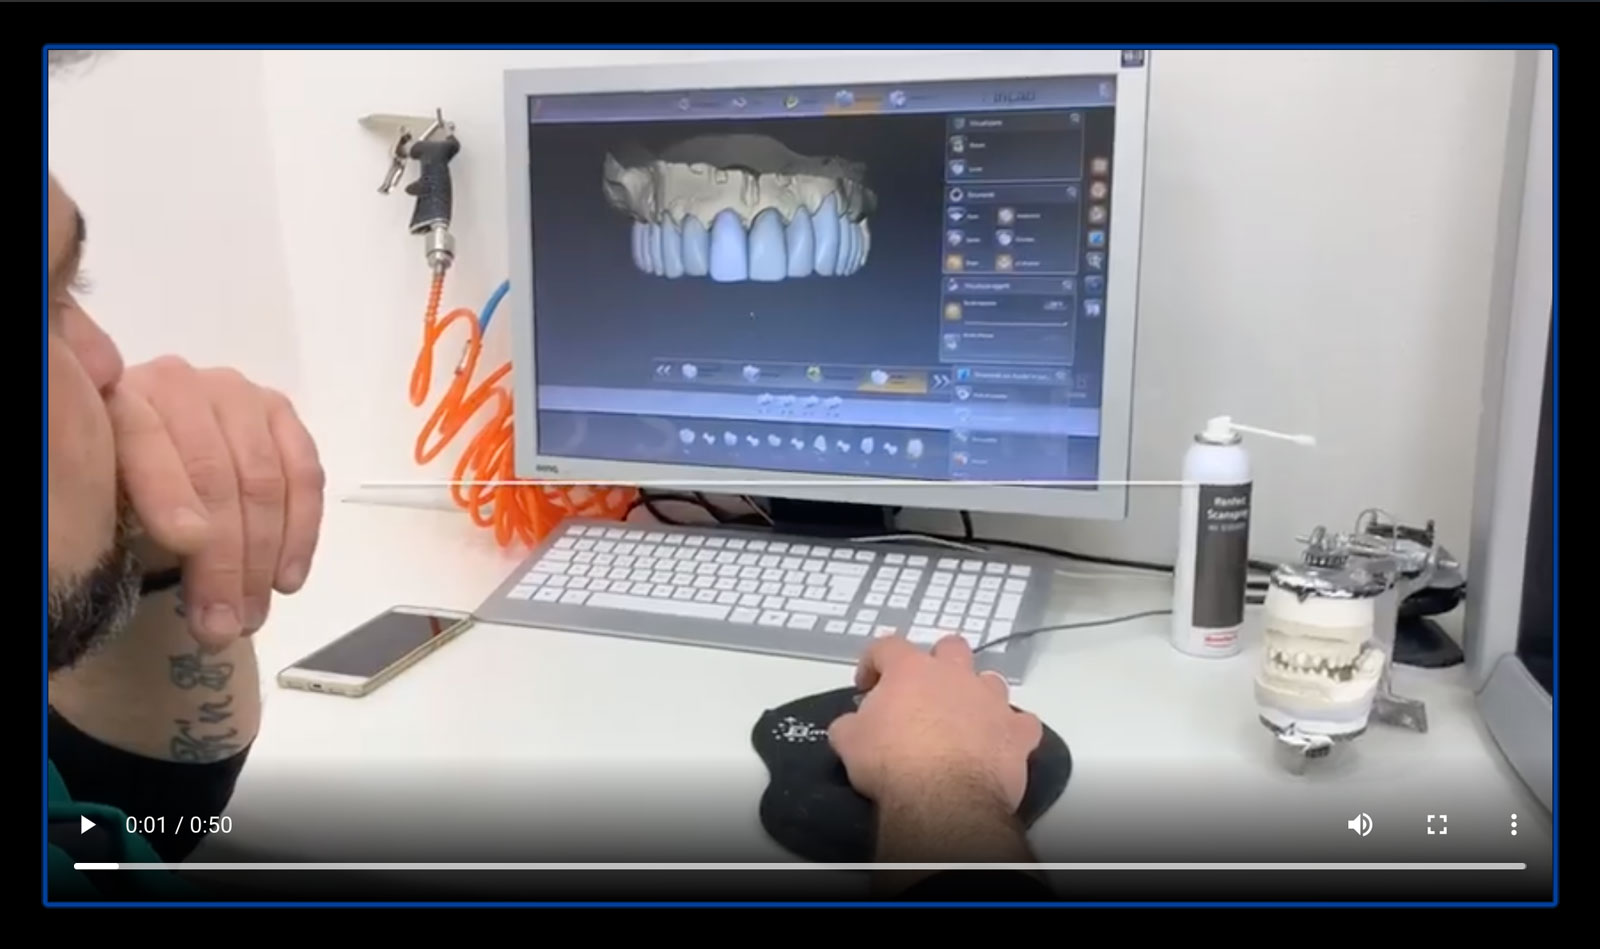 tecnico implantologo eseguo analisi implantologa guidata a computer